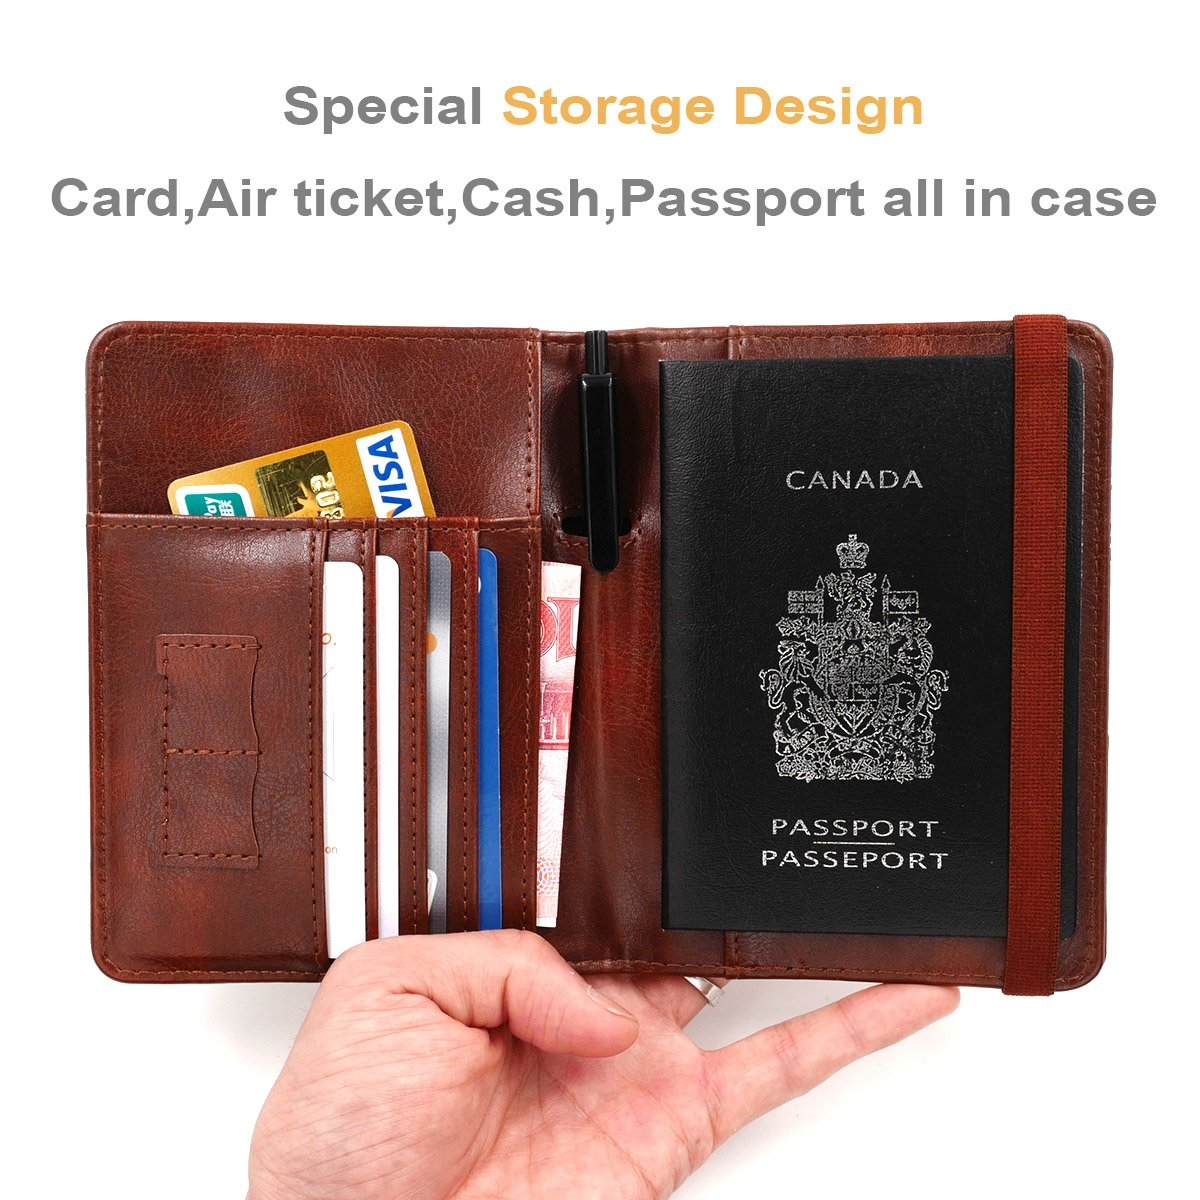 Kandouren RFID Blocking Passport Holder Cover Case,travel luggage passport wallet made with Brown Map Crazy Horse PU Leather for Men & Women by kandouren (Image #3)